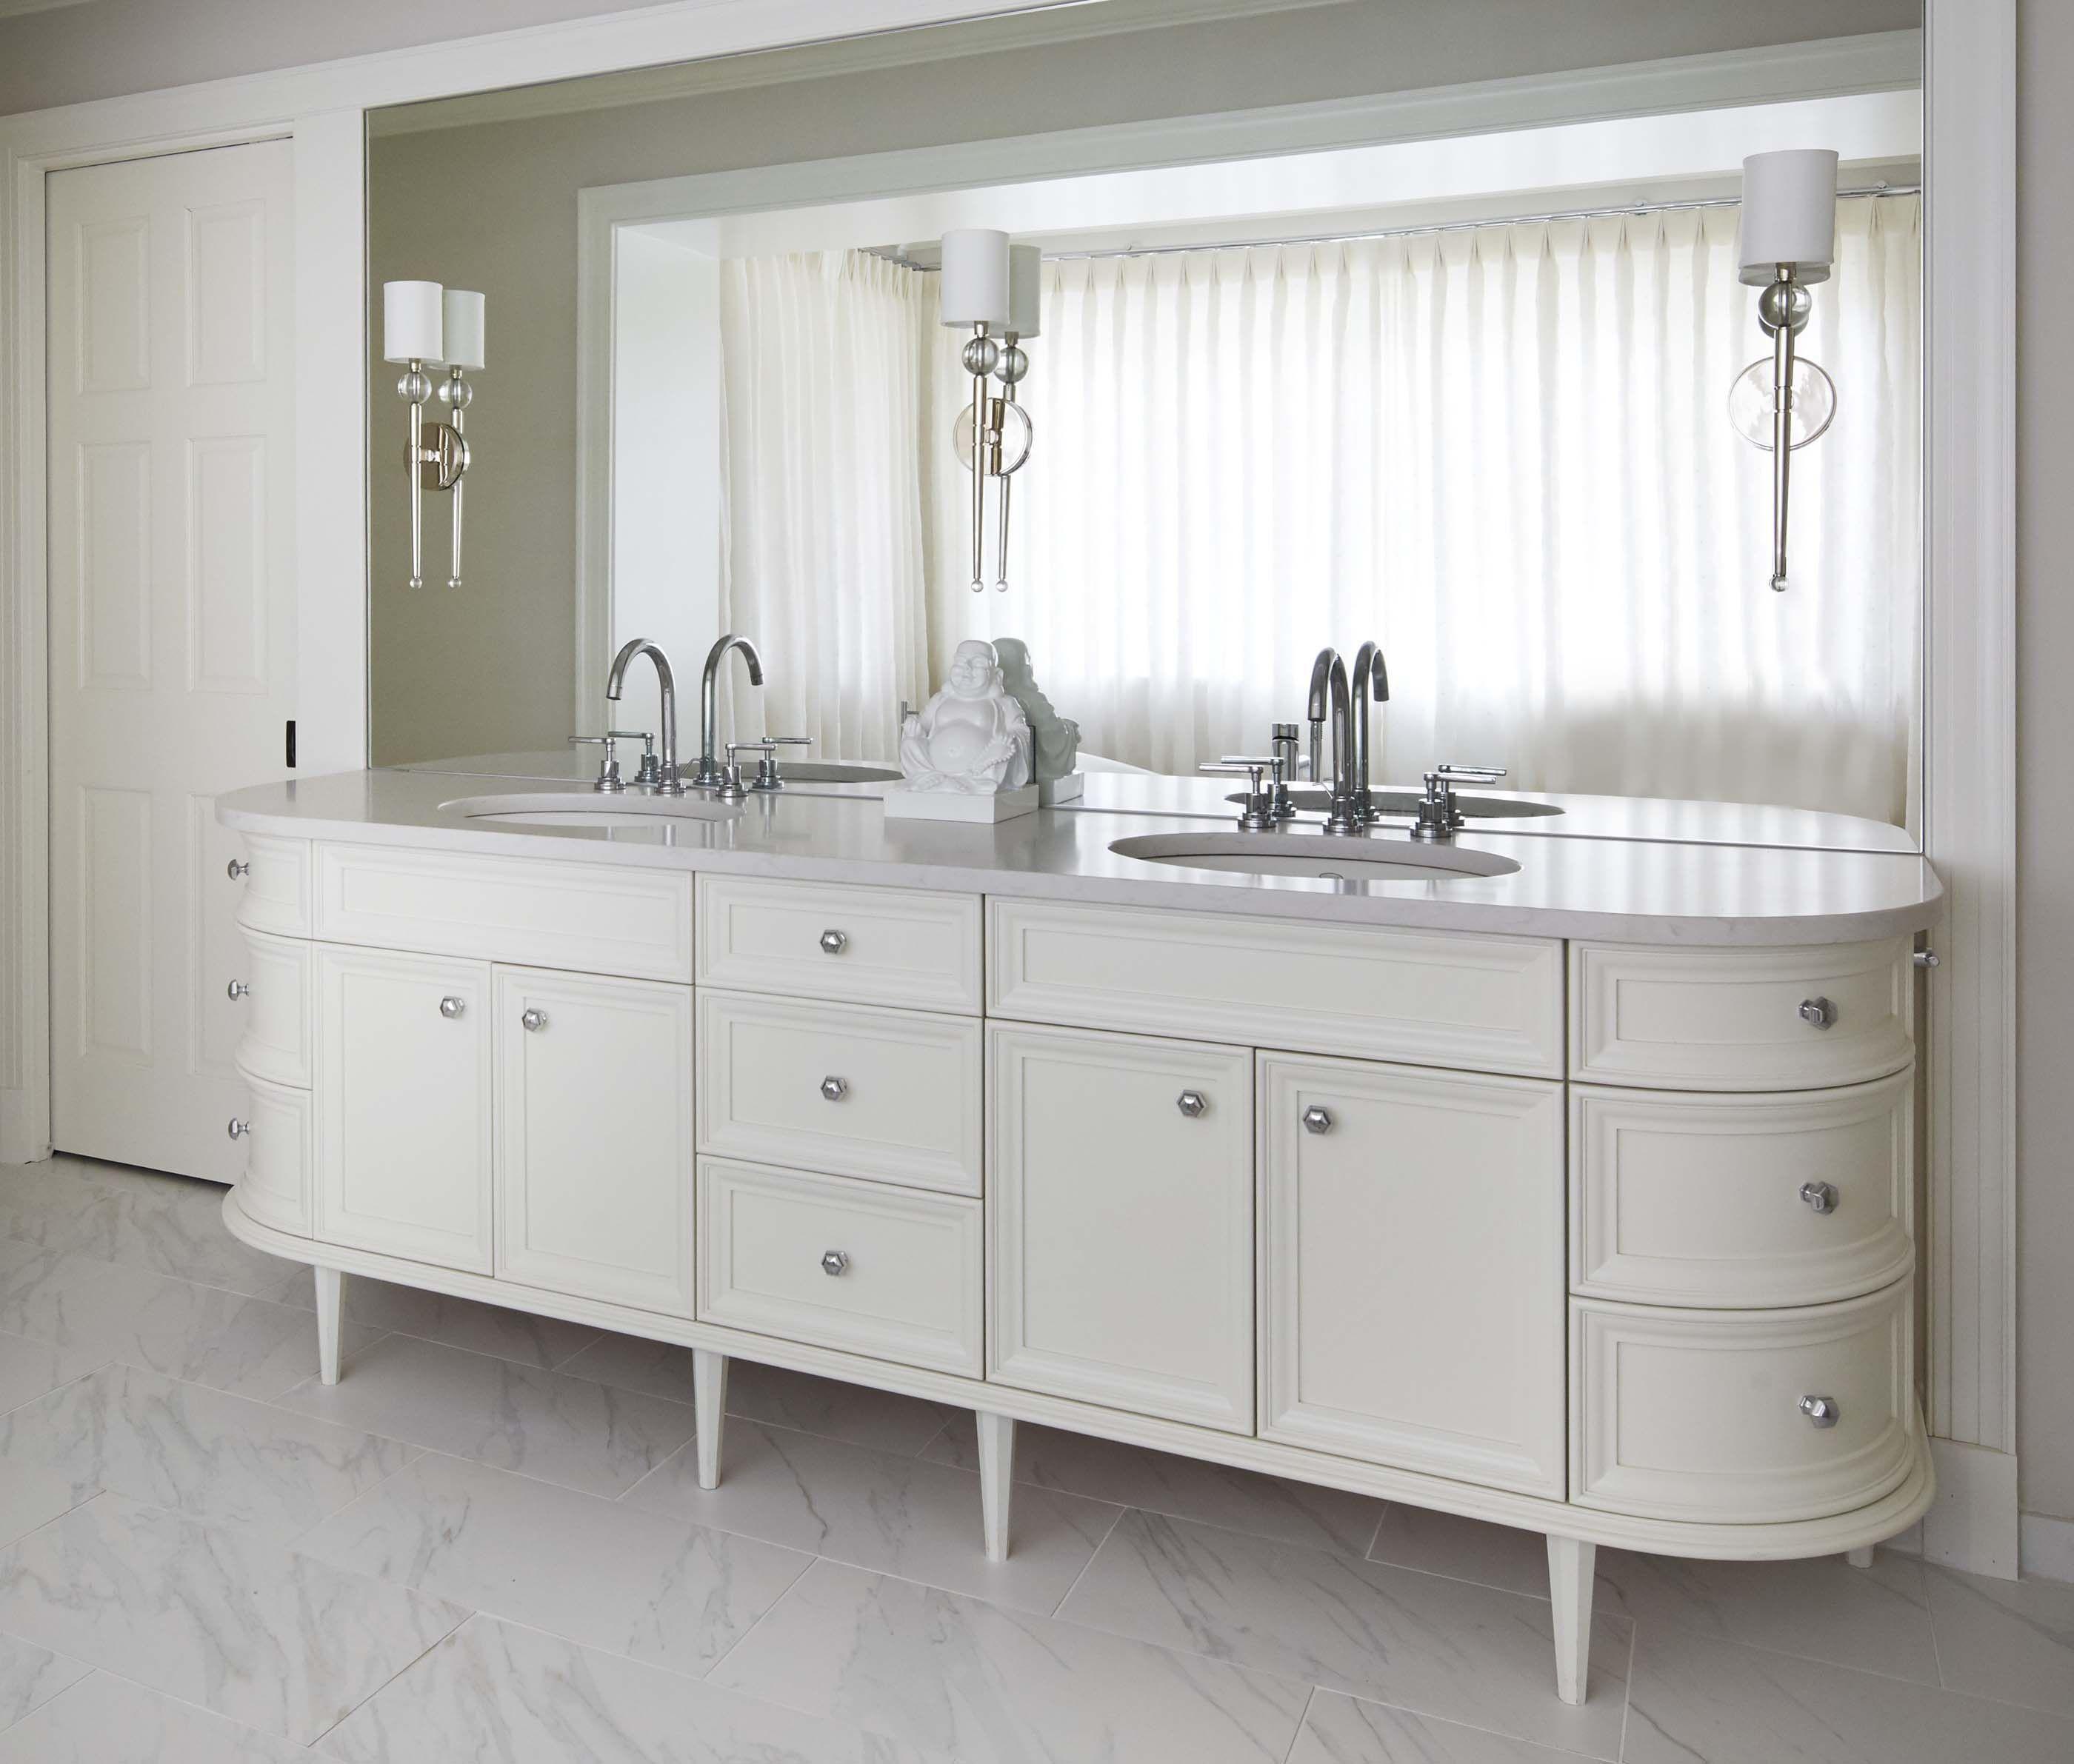 Morgante Wilson Architects designed this Master Bath double vanity ...